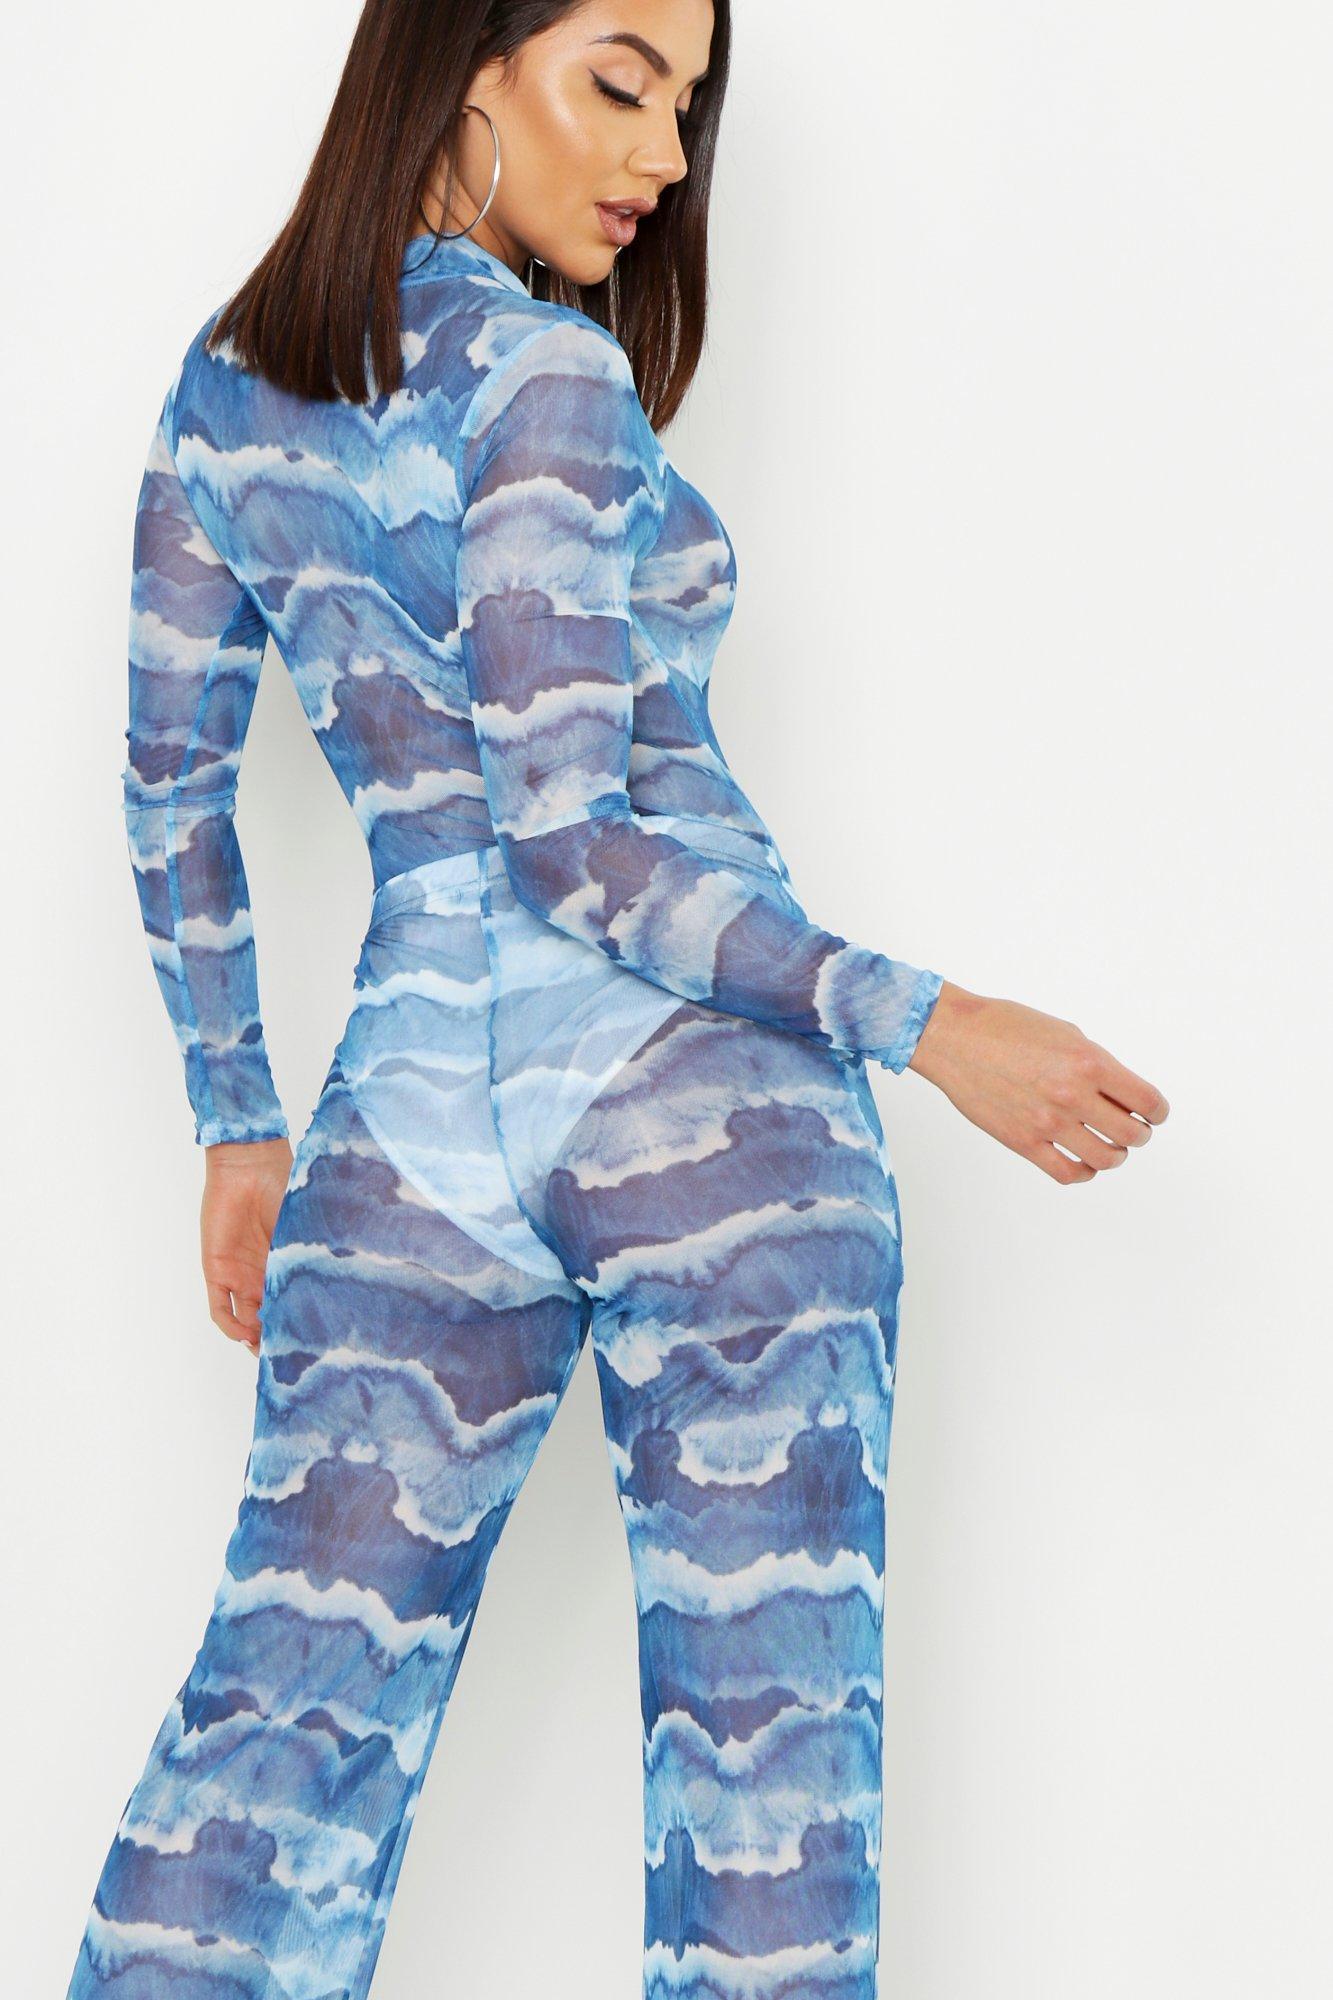 4a78a6aaa890 Boohoo - Blue Tie Dye Mesh Pant Lined Loose Leg Trouser - Lyst. View  fullscreen